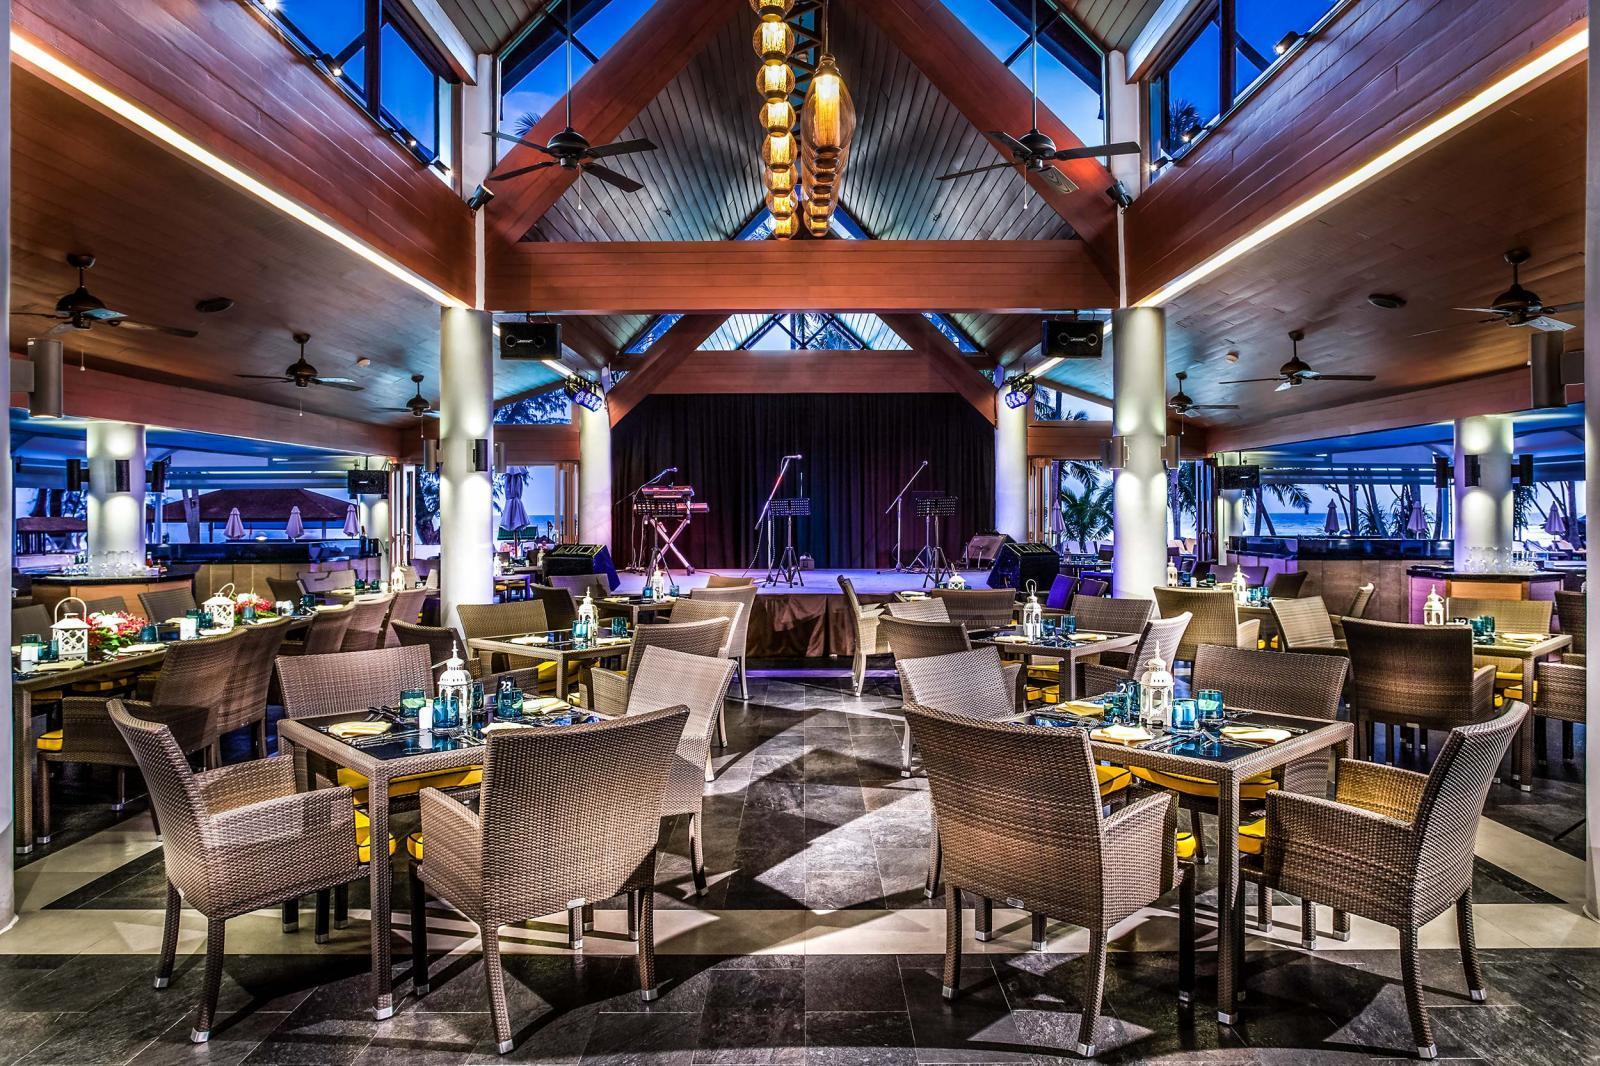 Фото ресторана в Le Meridien Phuket Beach Resort